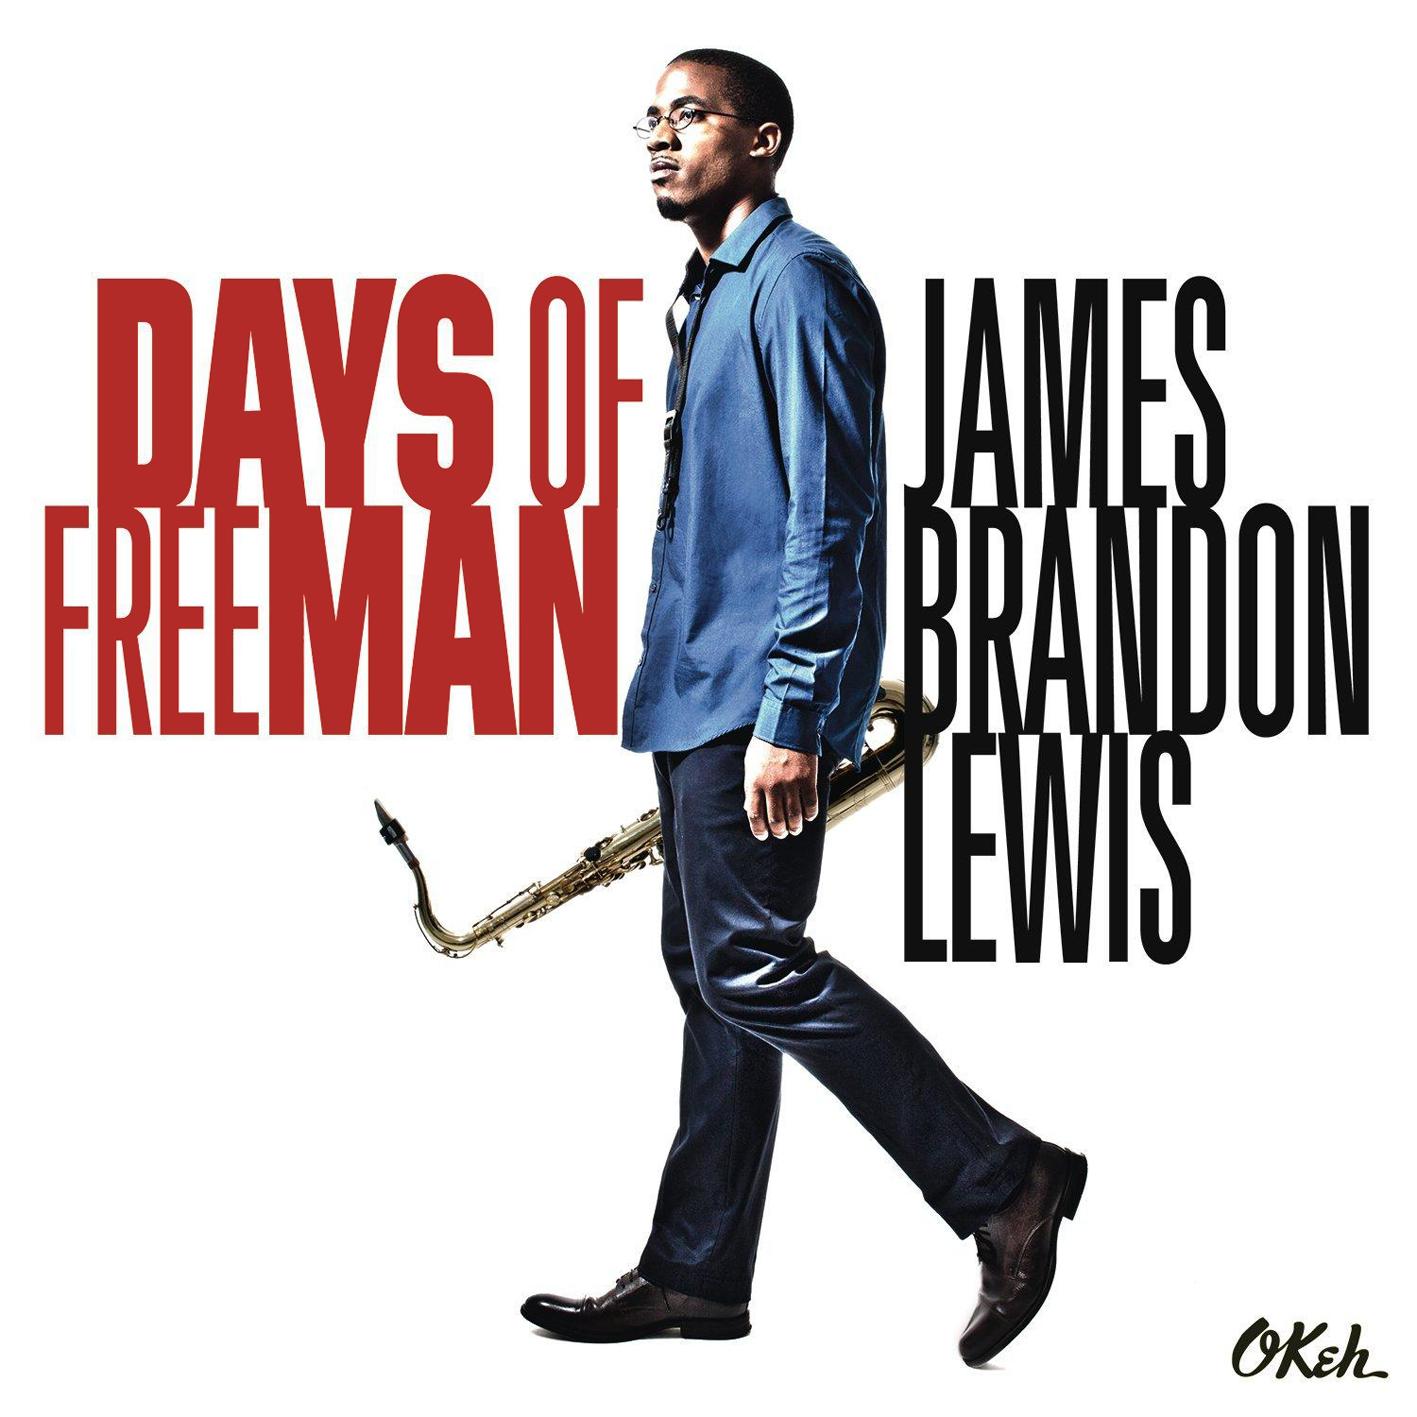 James Brandon Lewis - Days Of FreeMan (2015) [Official Digital Download]